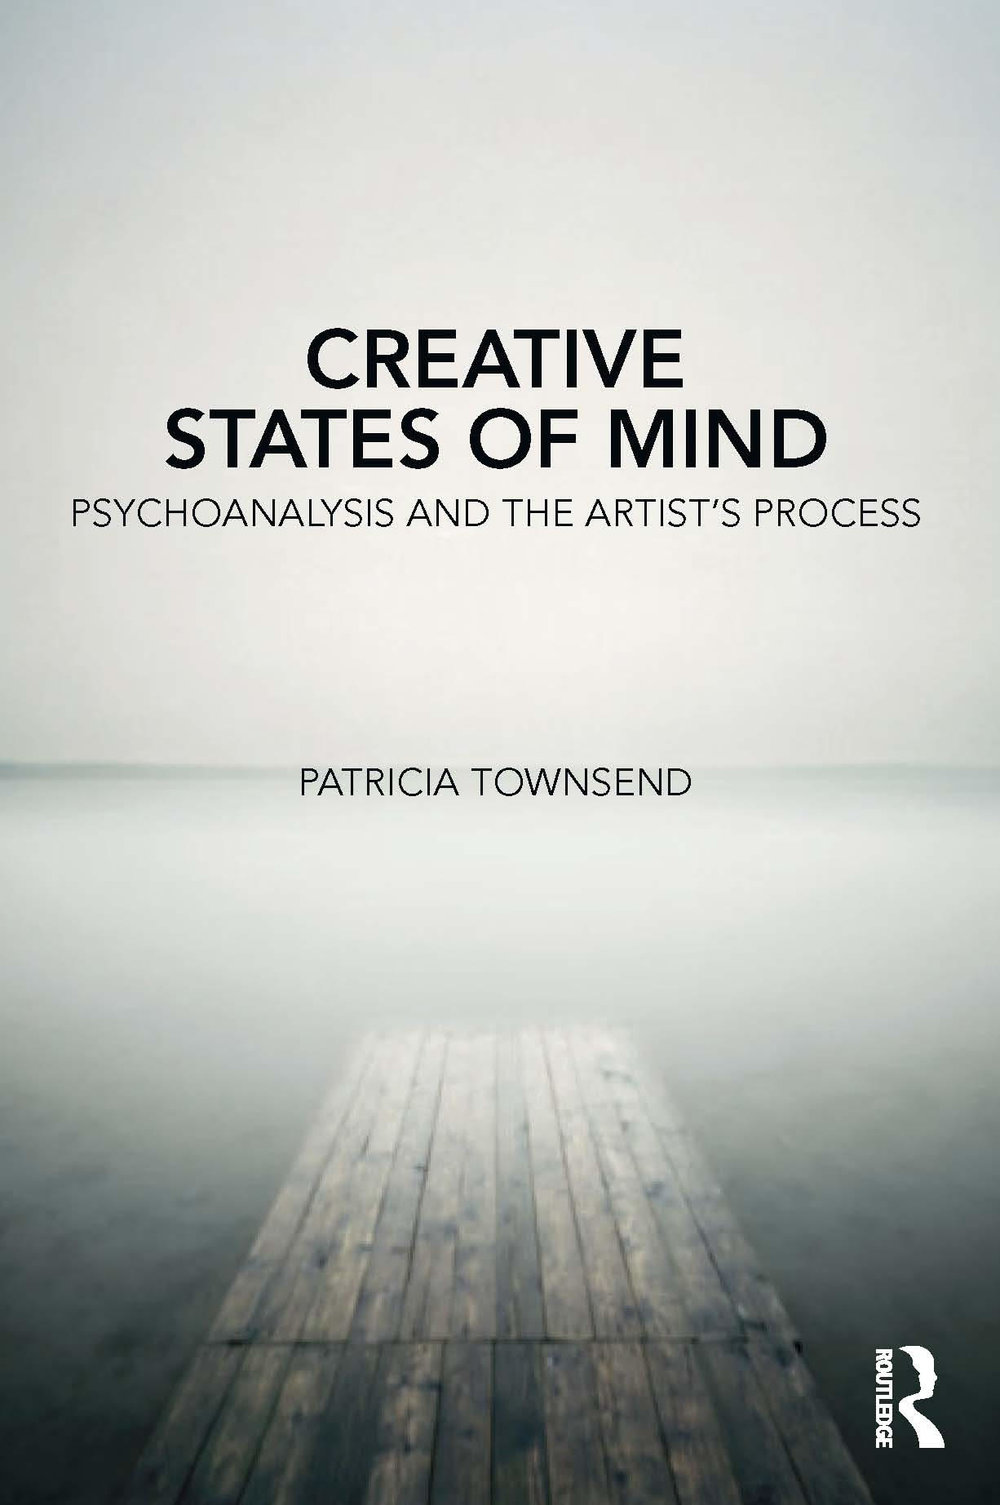 Creative States of Mind: Psychoanalysis & The Artist's Process